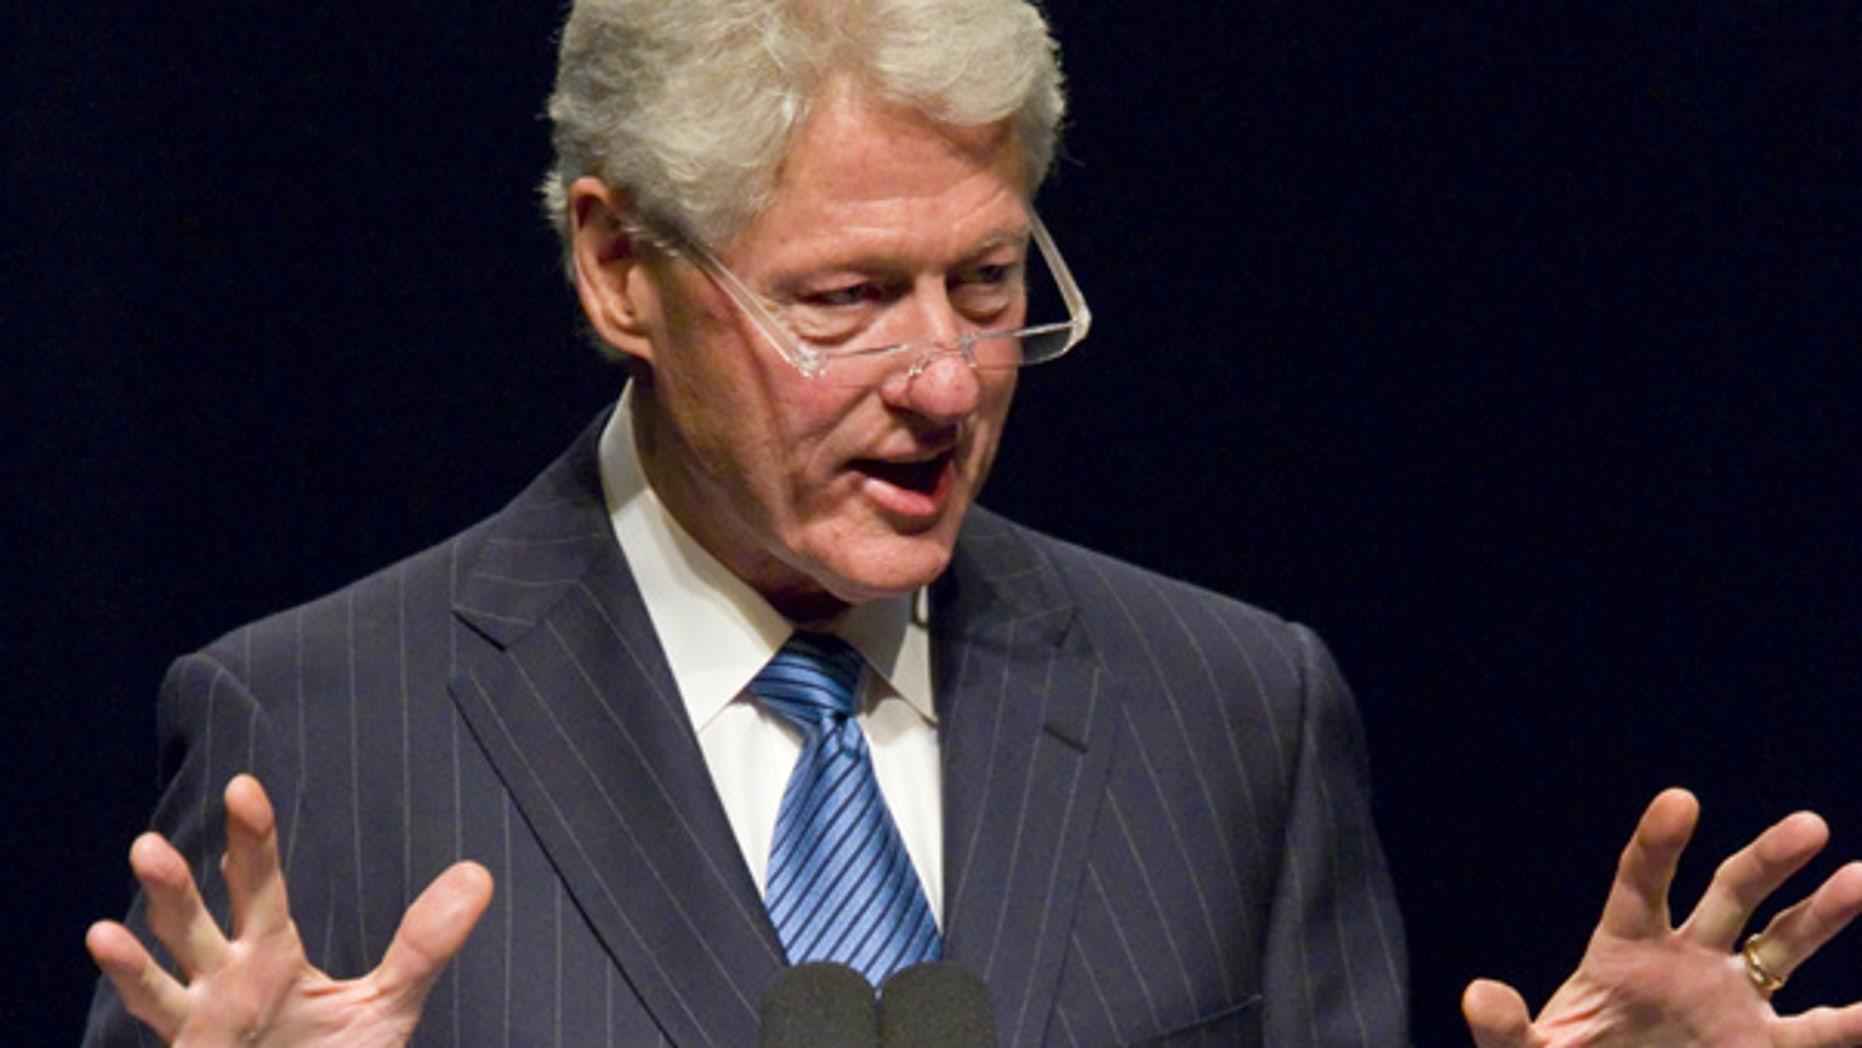 Nov. 30: Former President Bill Clinton speaks in Greensboro, N.C.